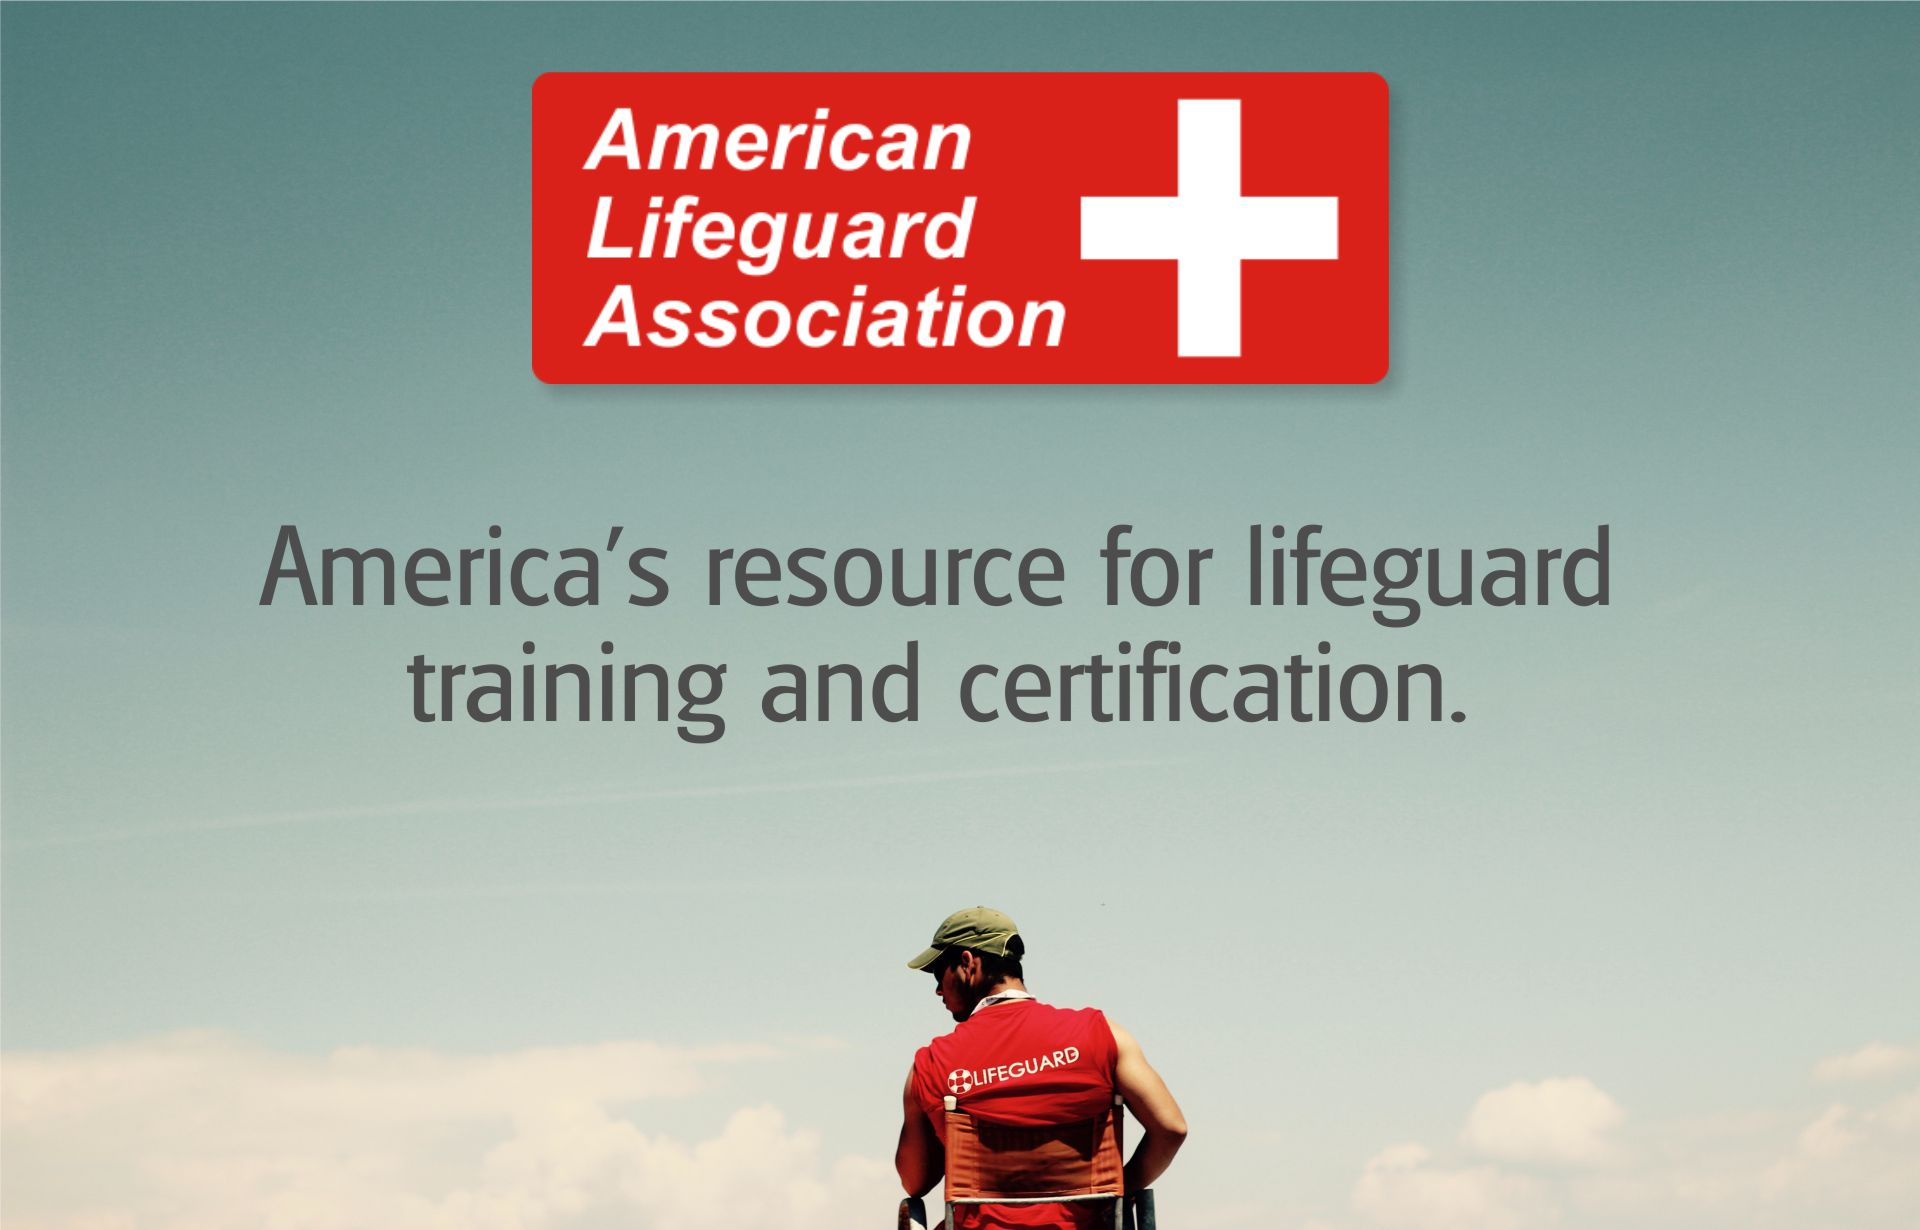 4f568f17fb0 American Lifeguard Association